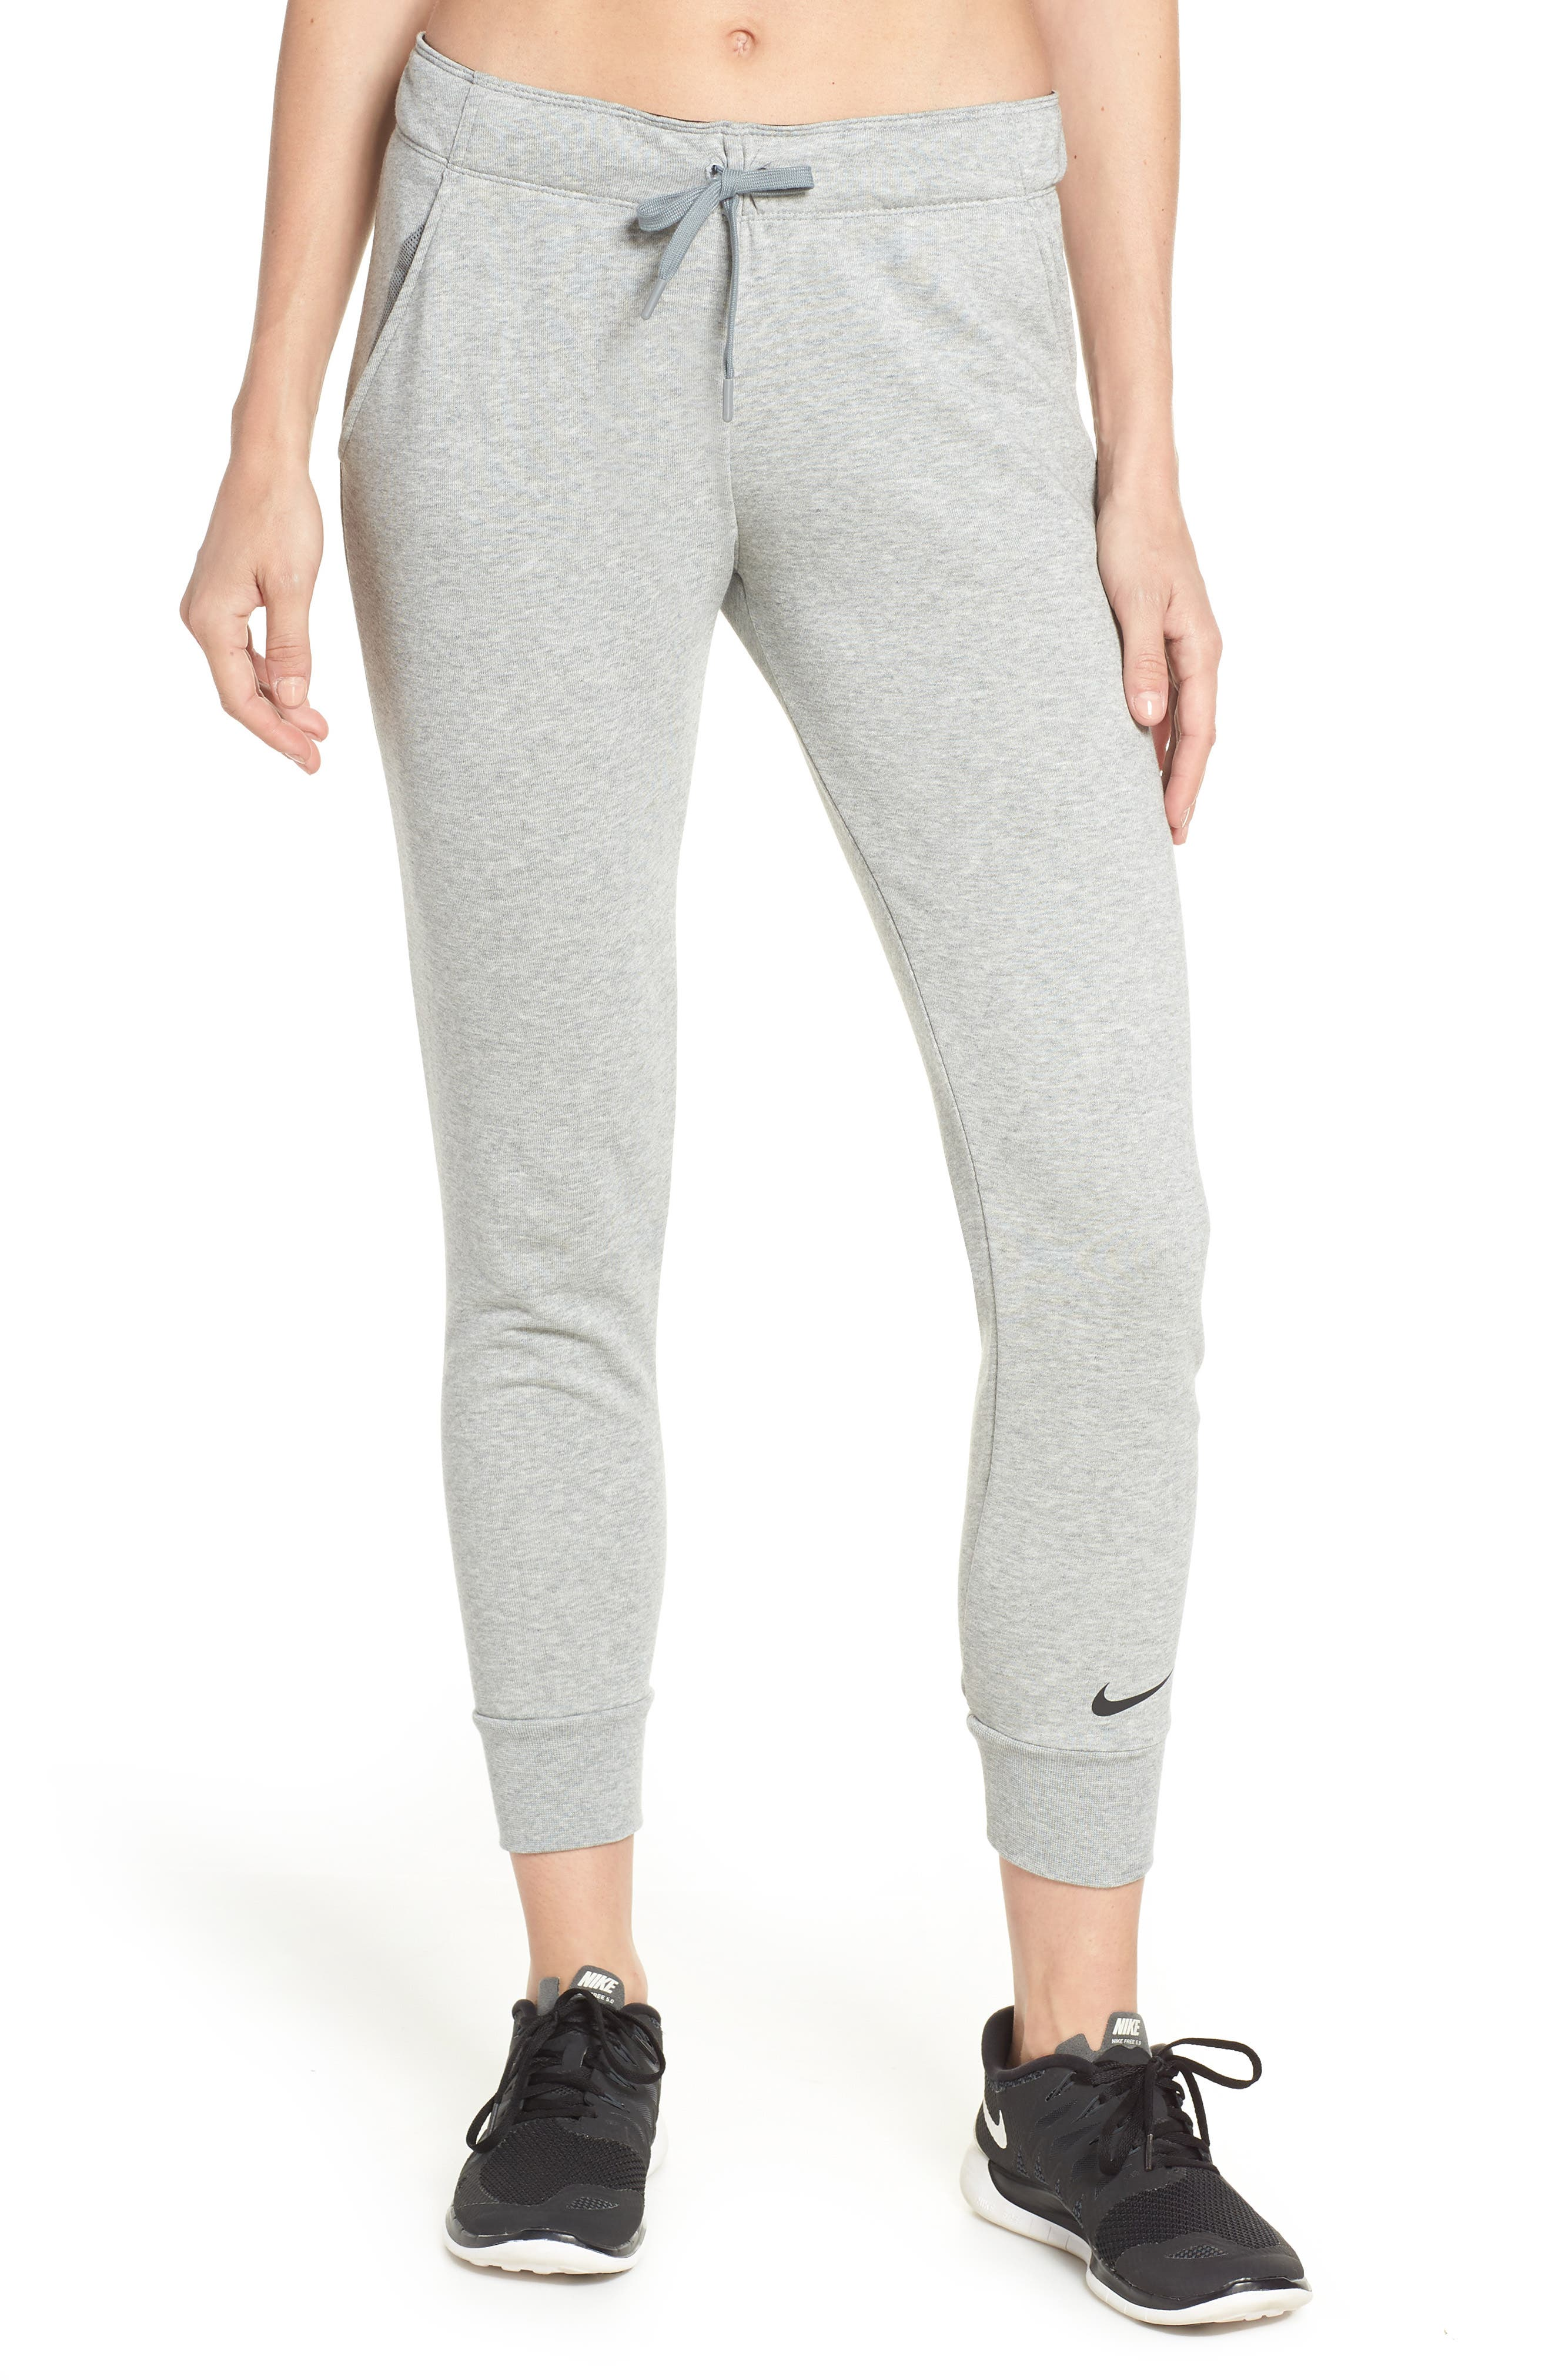 Tapered Training Pants,                         Main,                         color, DARK GREY HEATHER/ BLACK